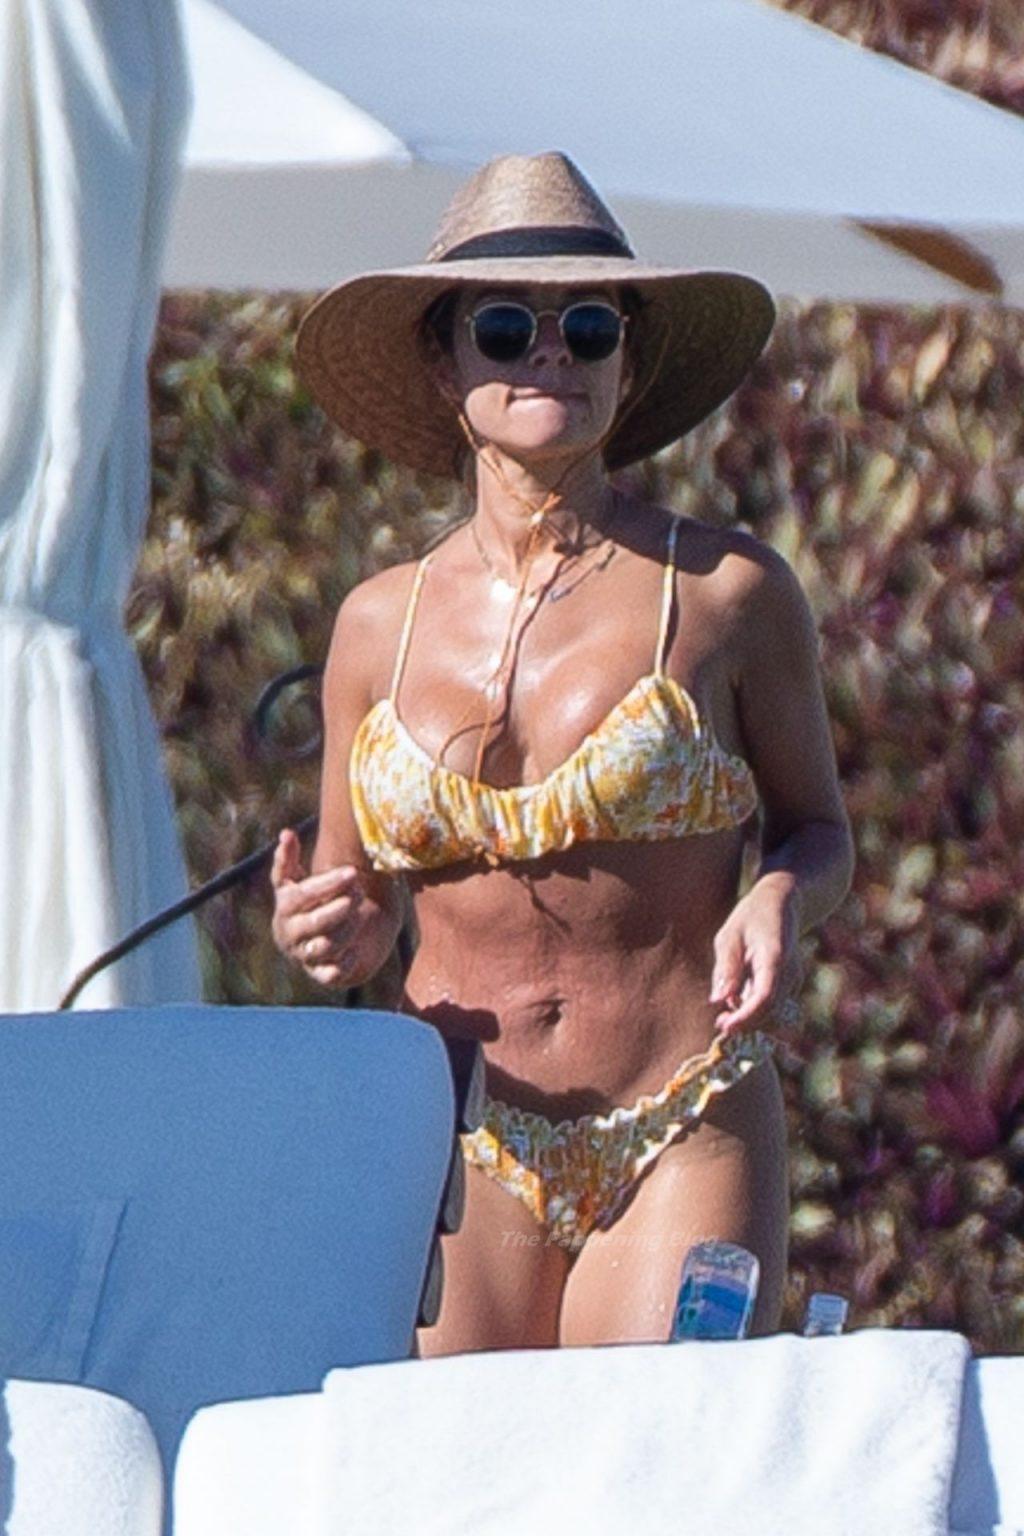 Jessie James Decker Displays Her Sexy Curves in Mexico (28 Photos)